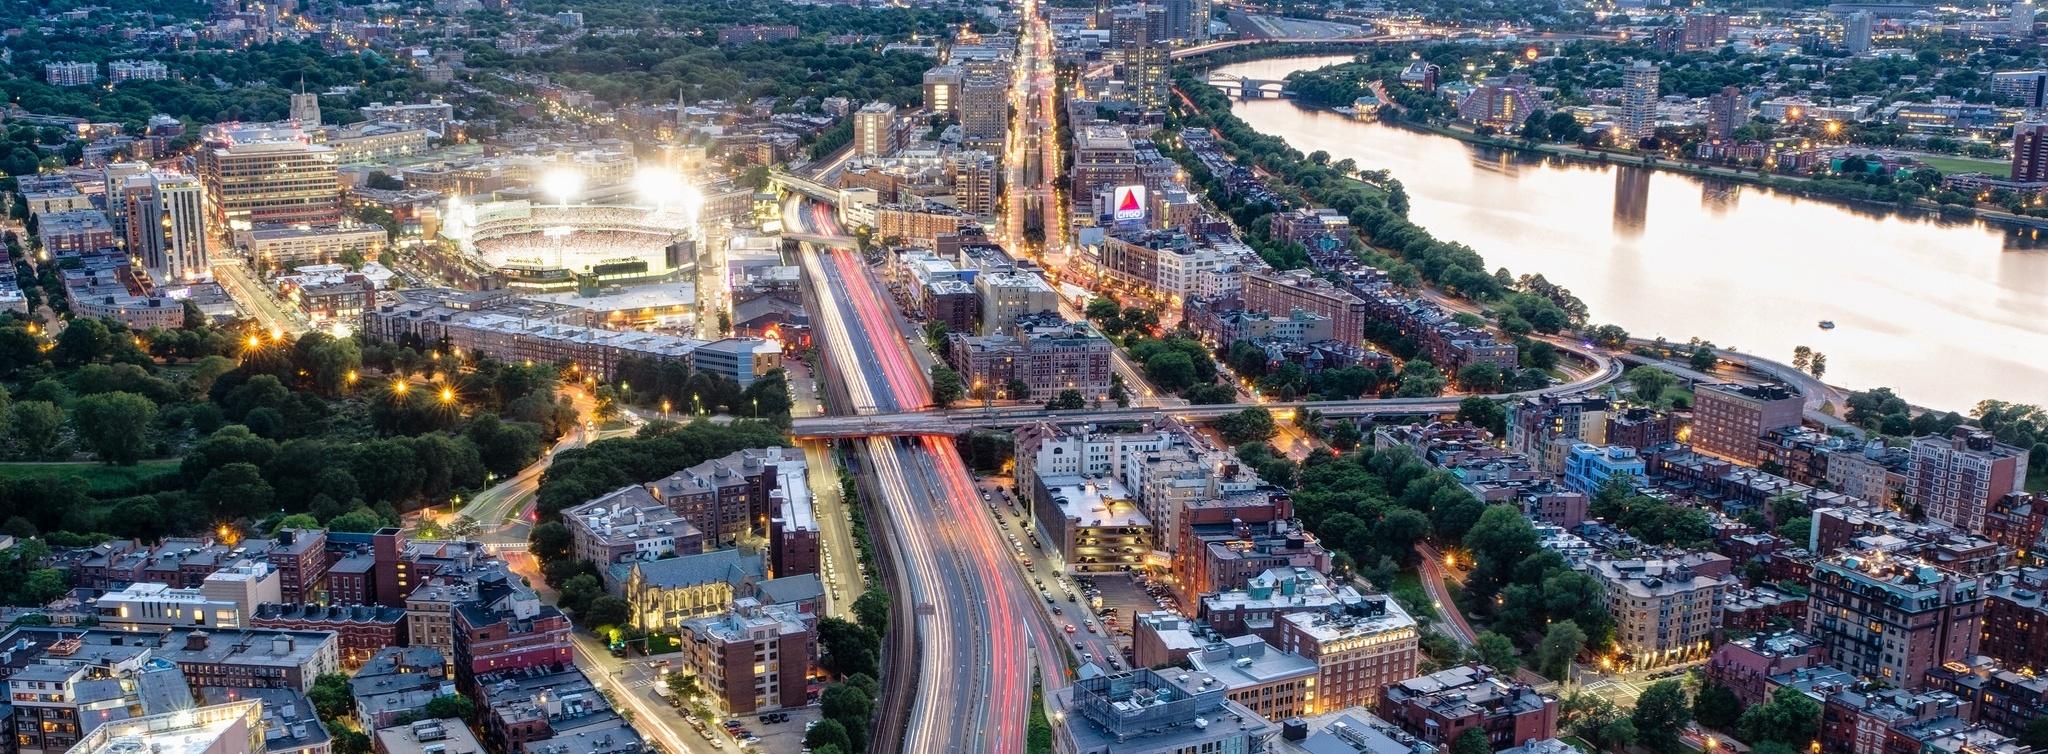 Boston-July2015-Robbie-Shade-flickr-061933-edited